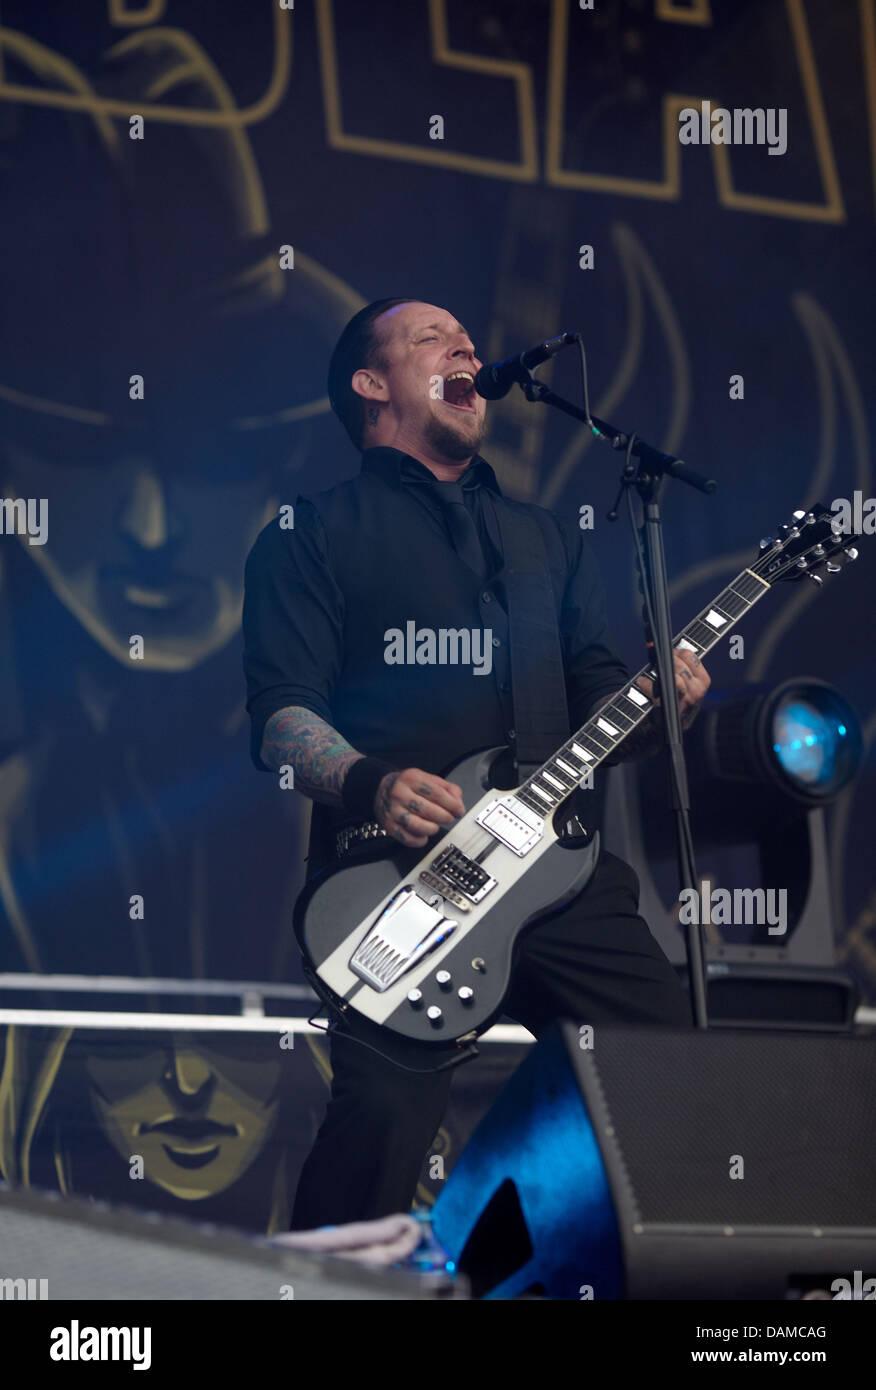 Frontmann Der Dänische Metal Band Volbeat Michael Schøn Poulsen